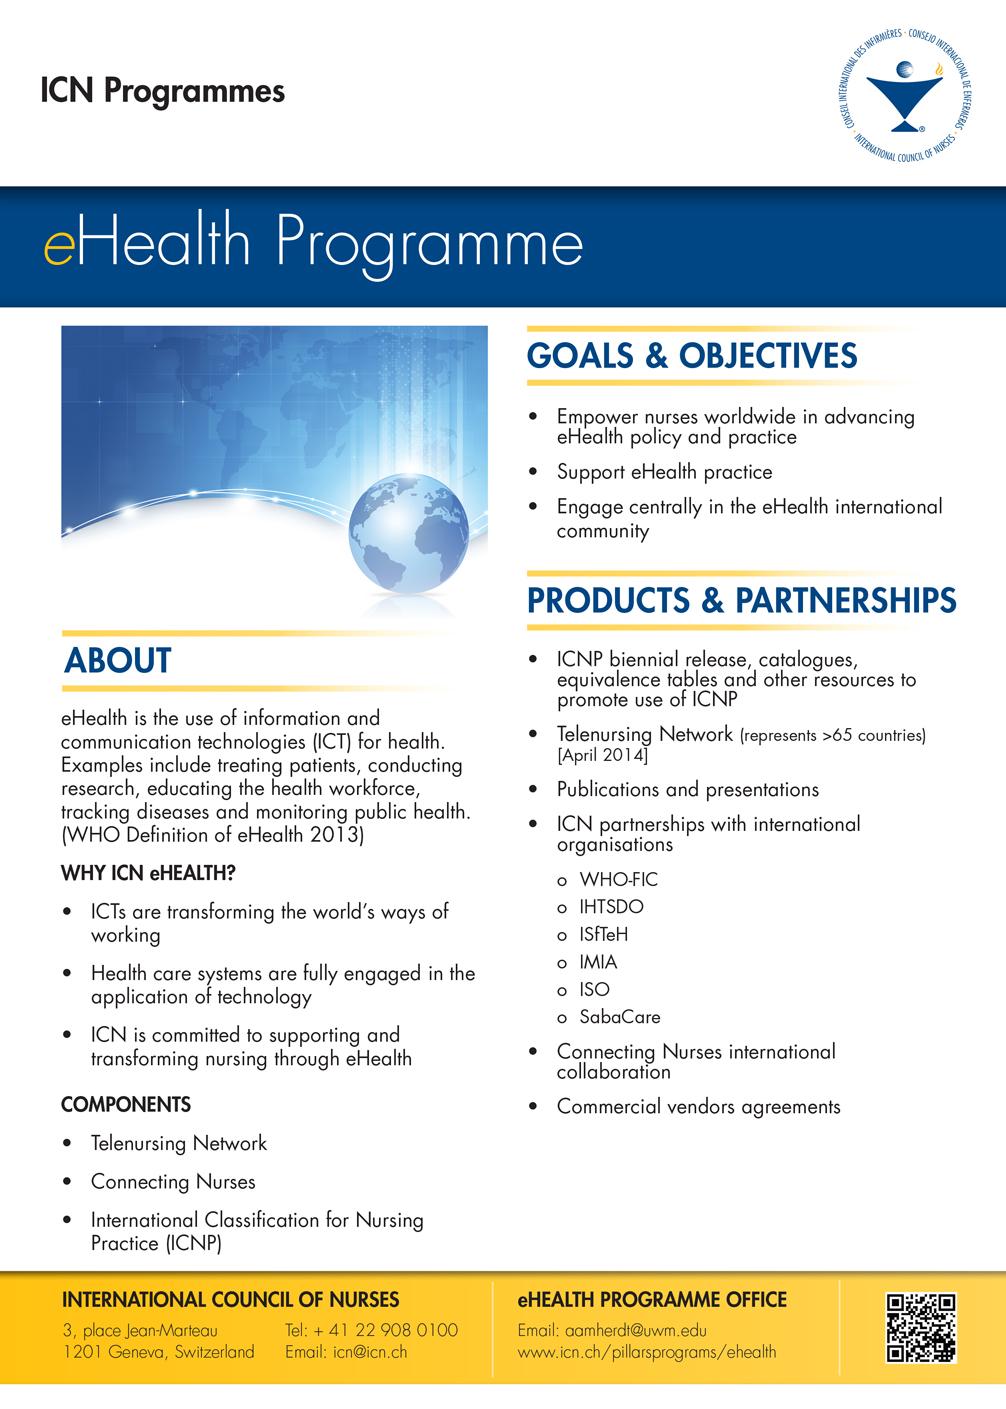 ICN-Programmes-1.jpg